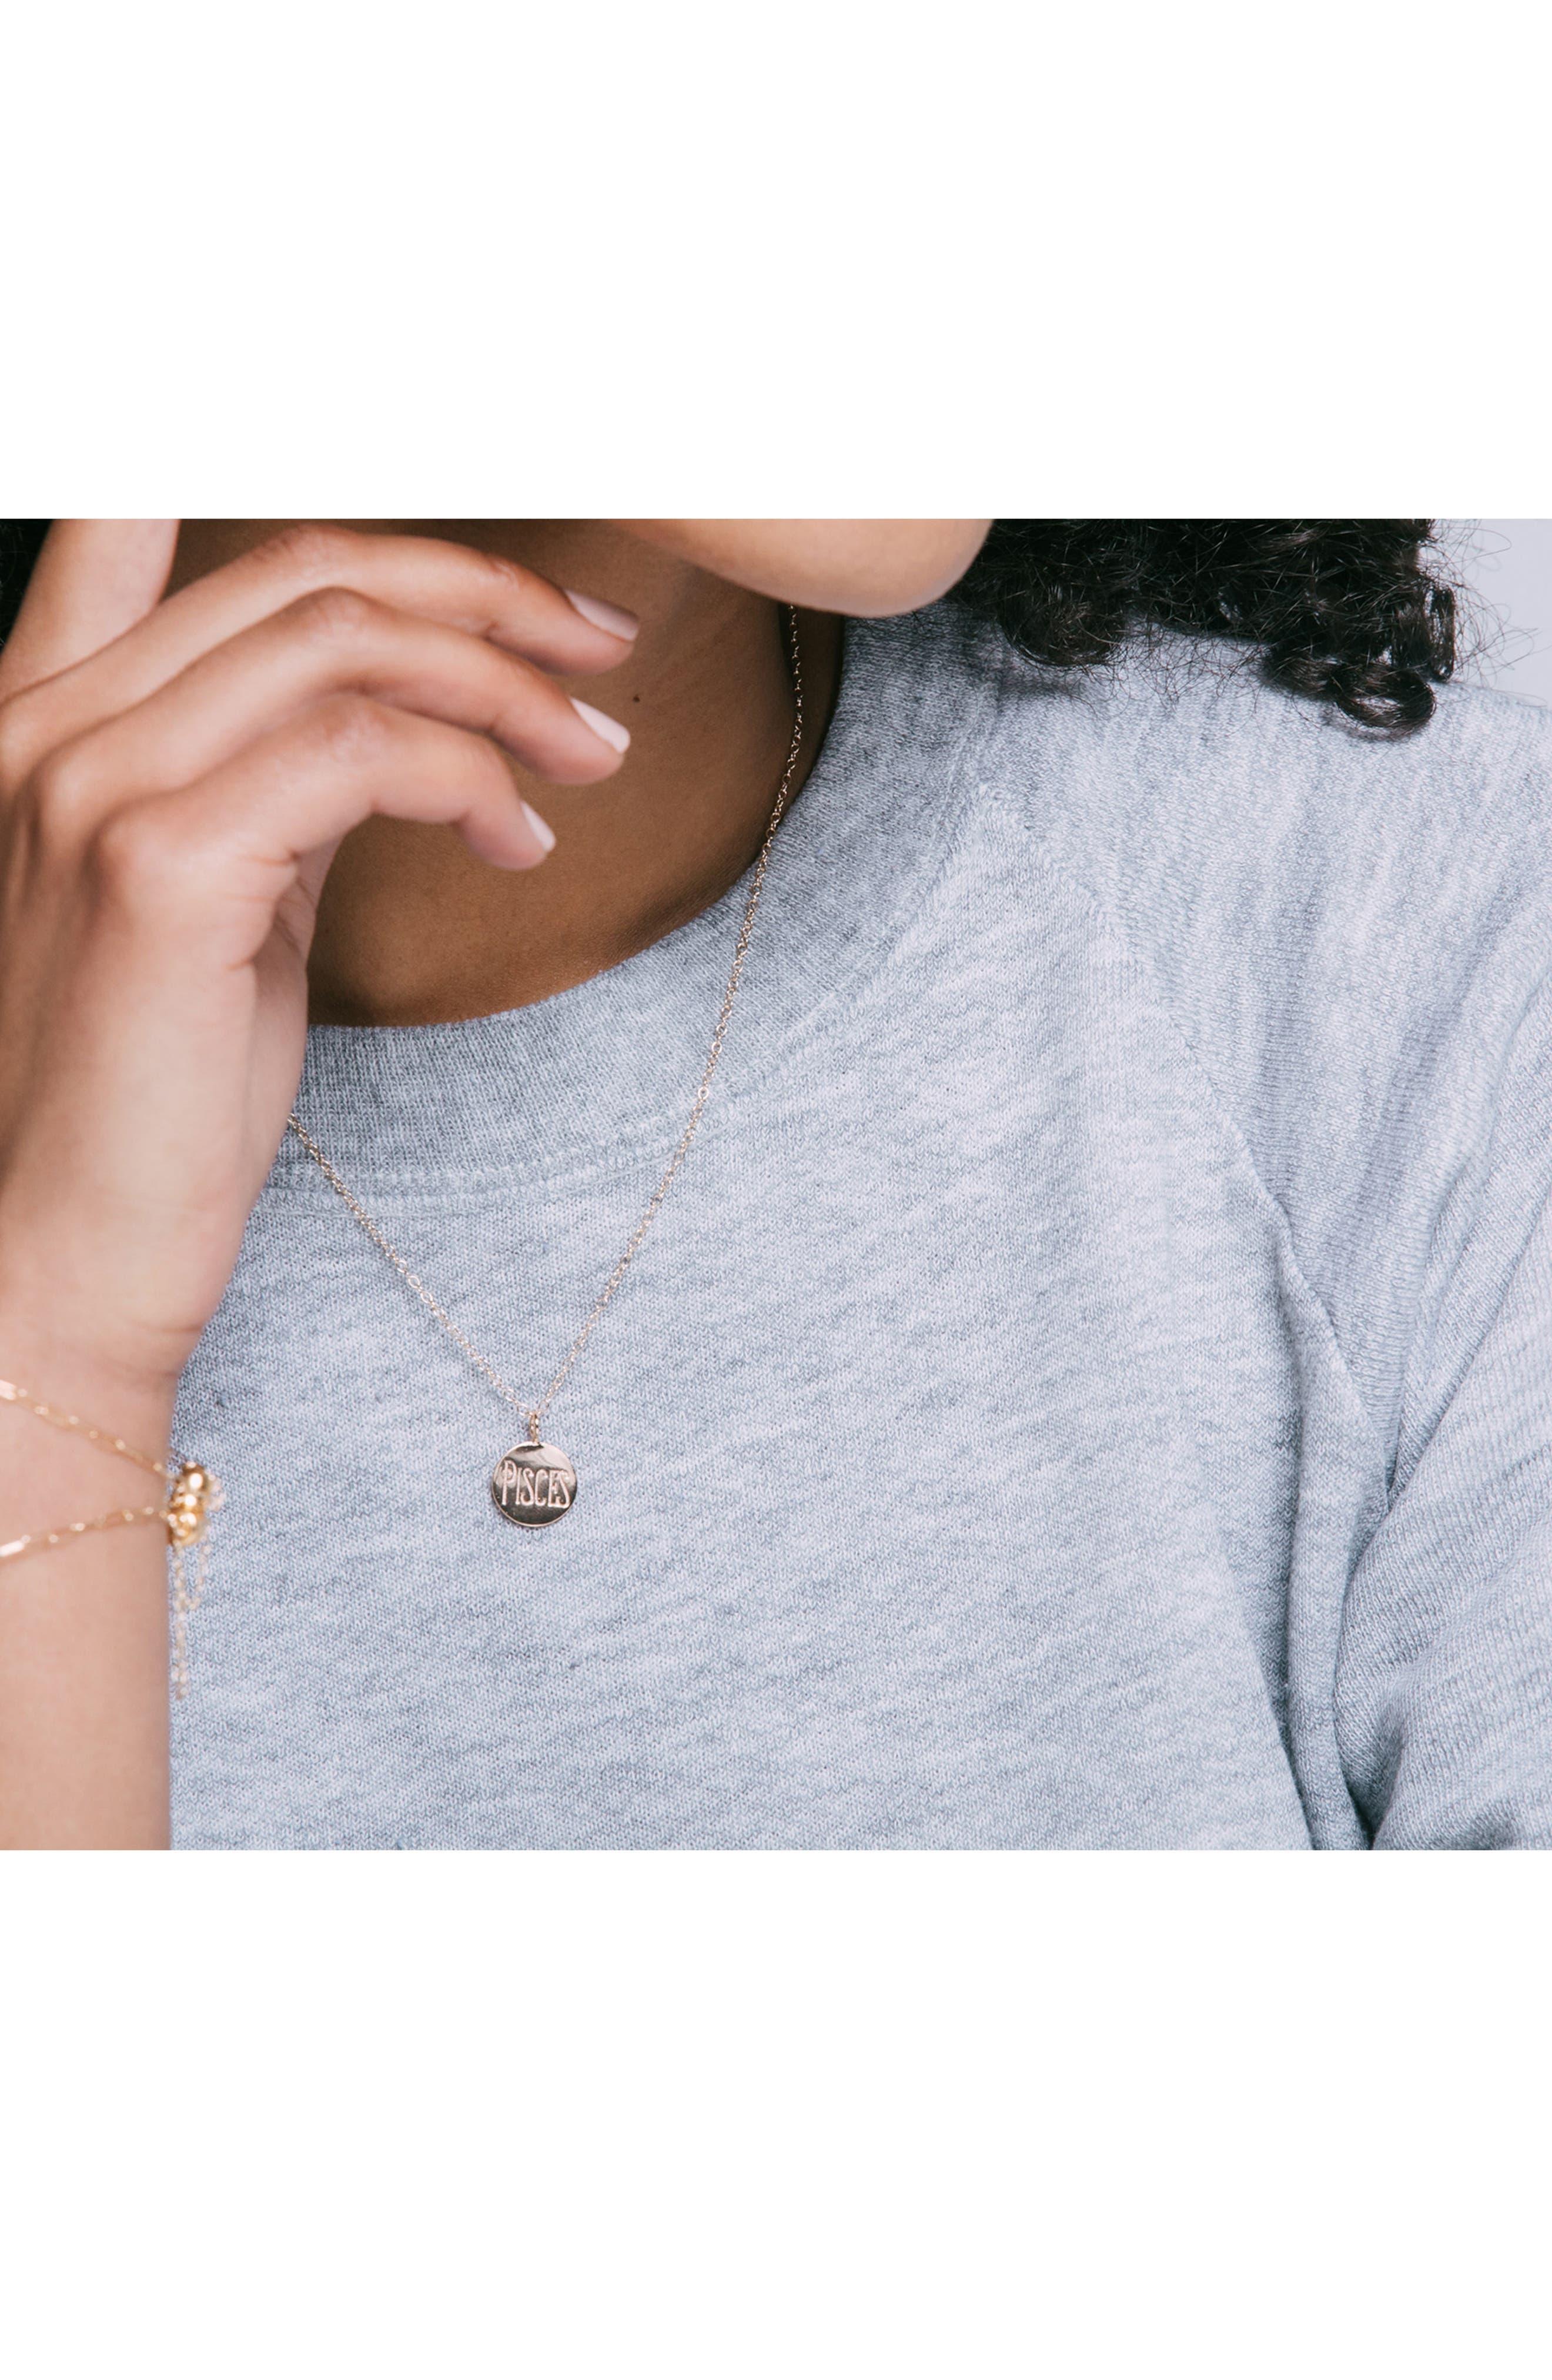 Zodiac Charm Necklace,                             Alternate thumbnail 2, color,                             Virgo - Silver